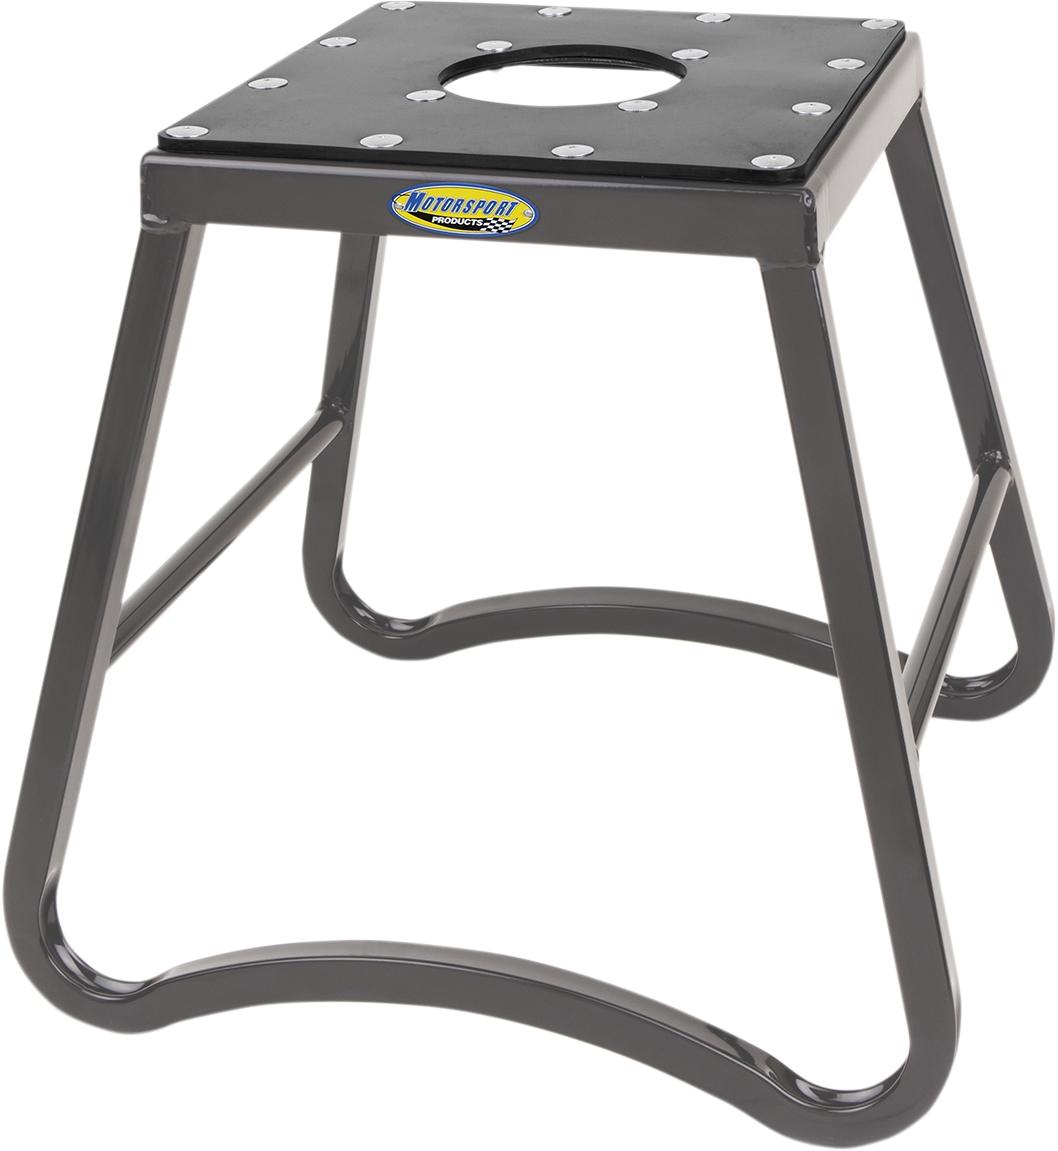 Motorsport Products SX1 Mini Stand